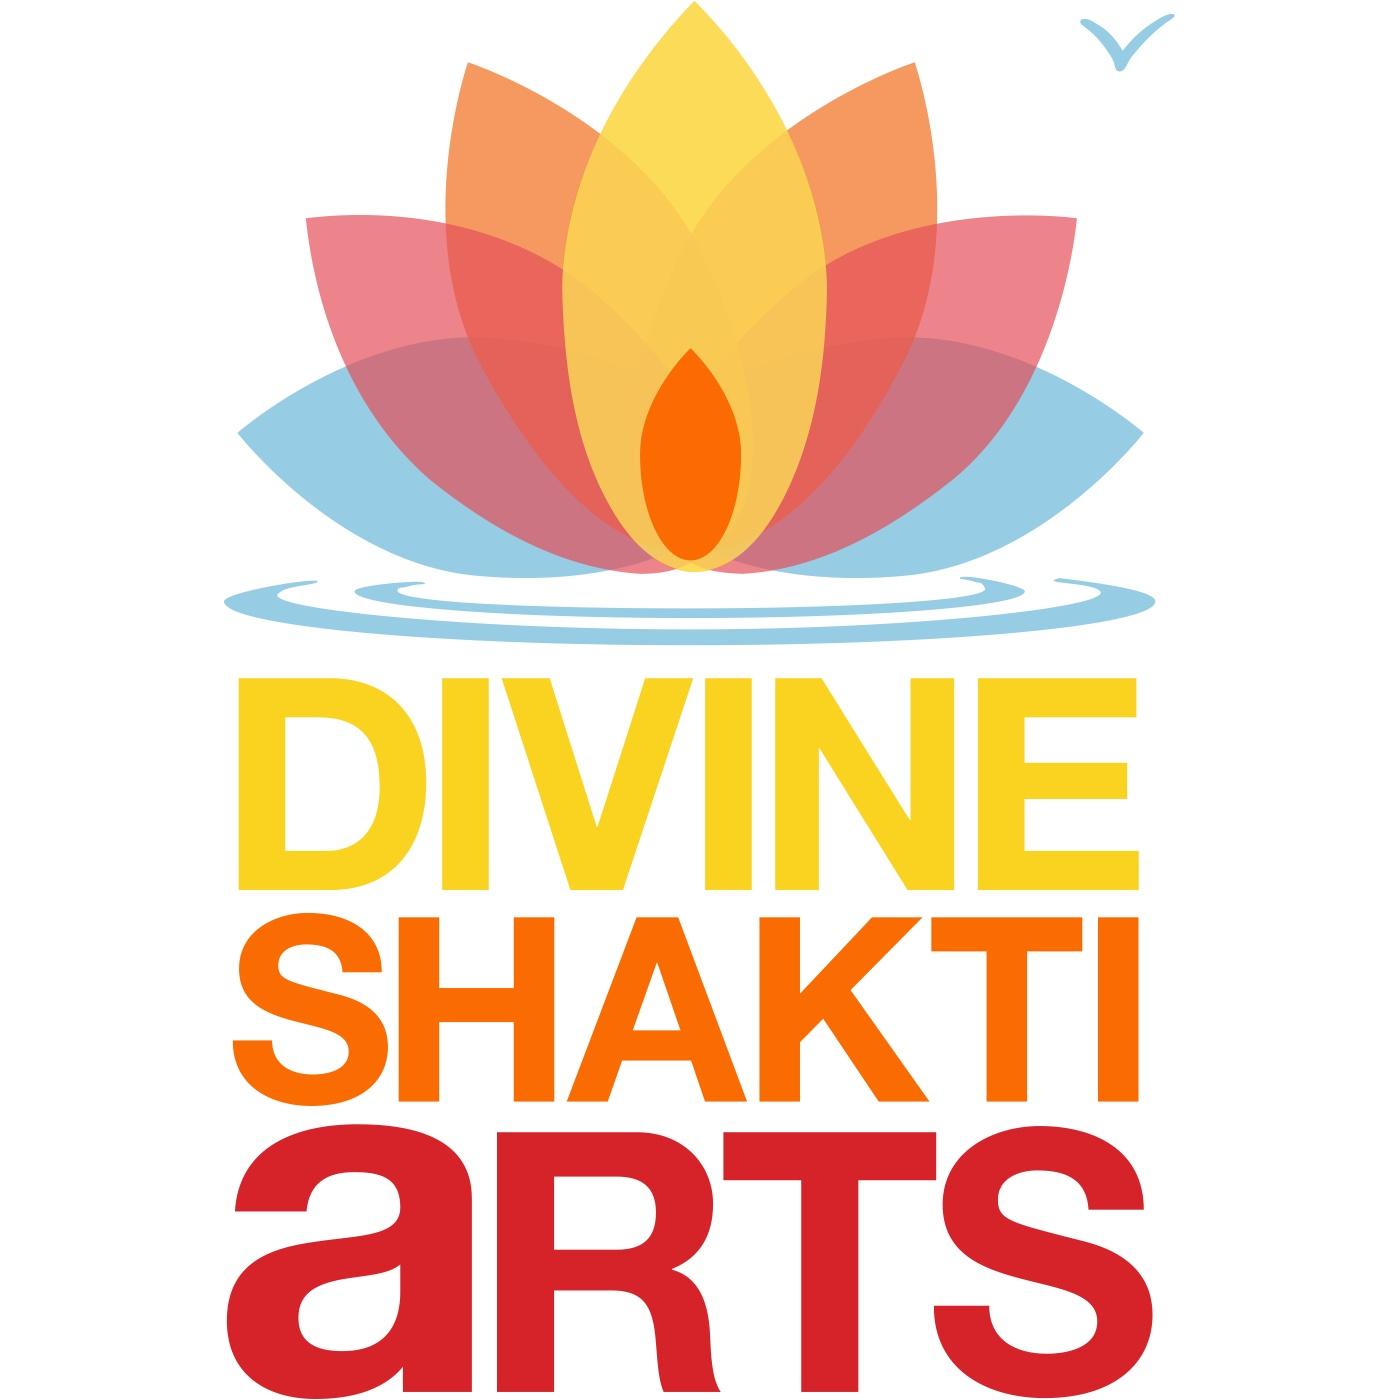 Divine Shakti Arts